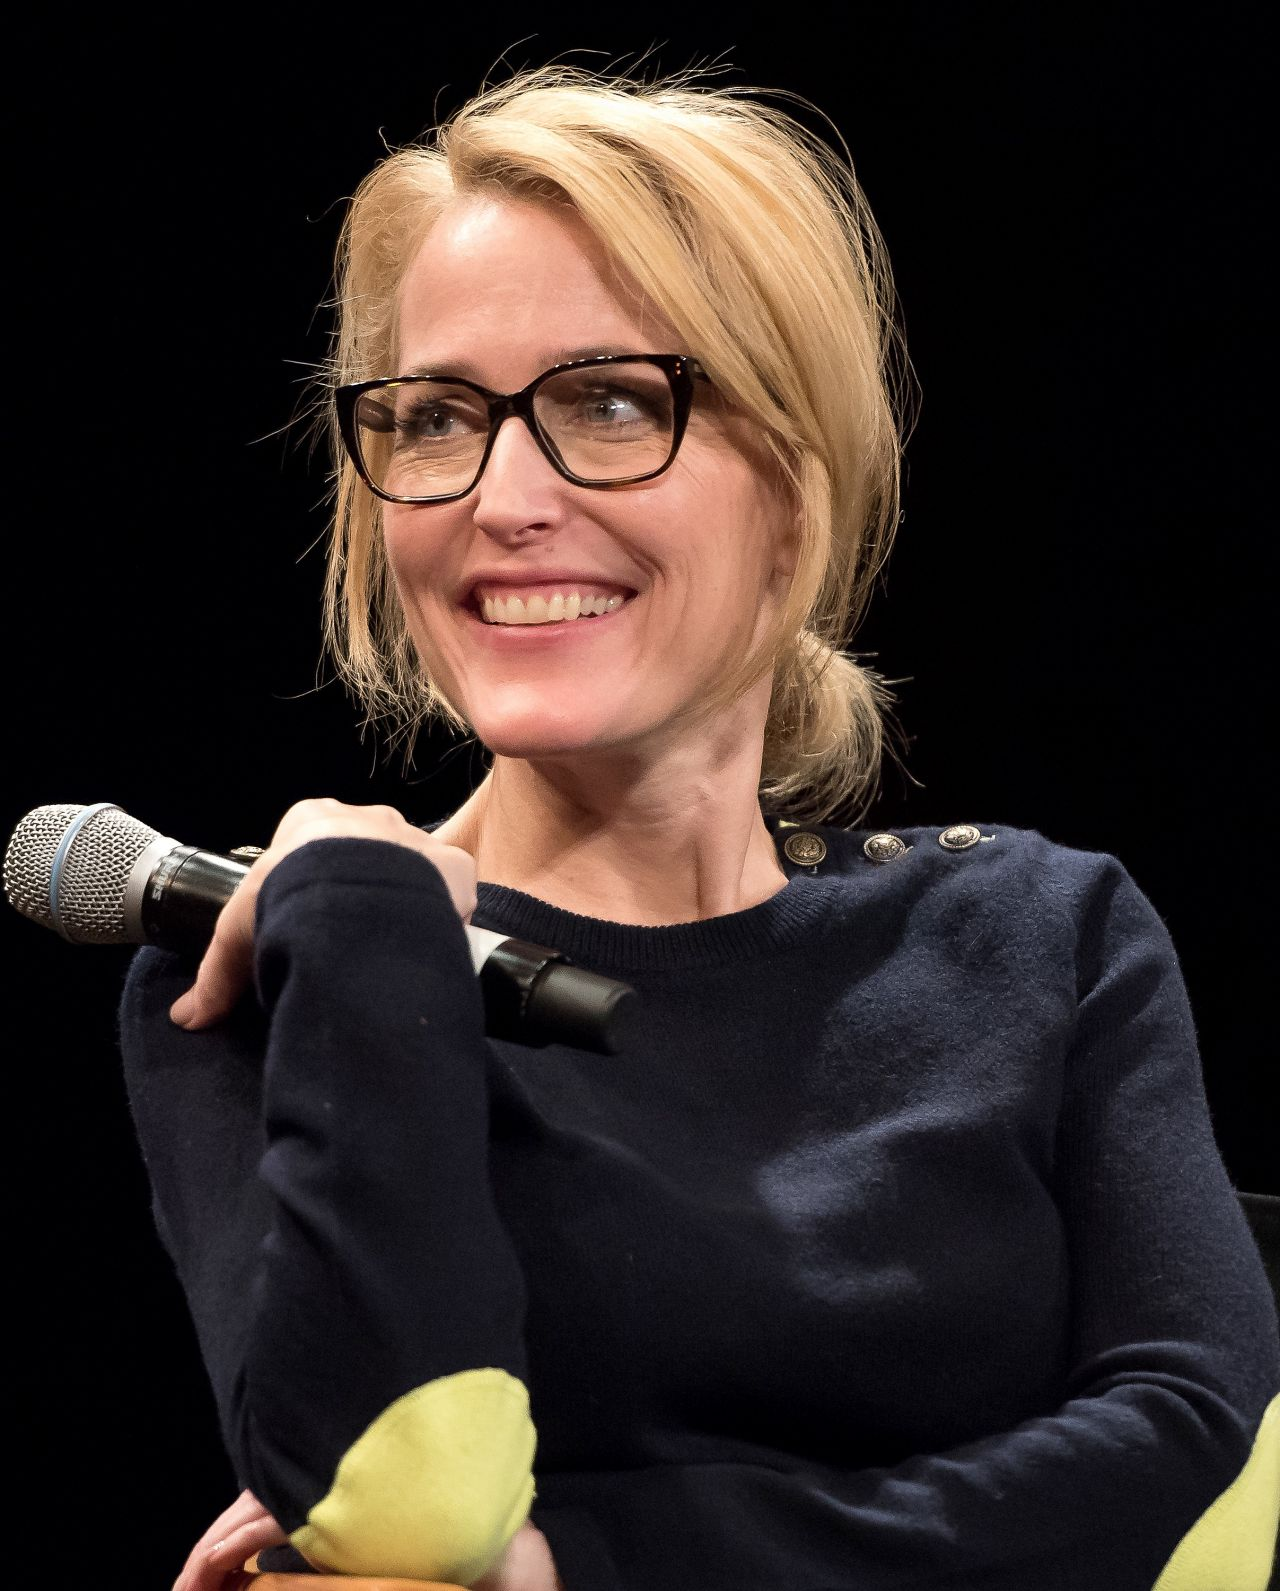 Gillian Anderson Tribeca Talks In Support Of Un Women S